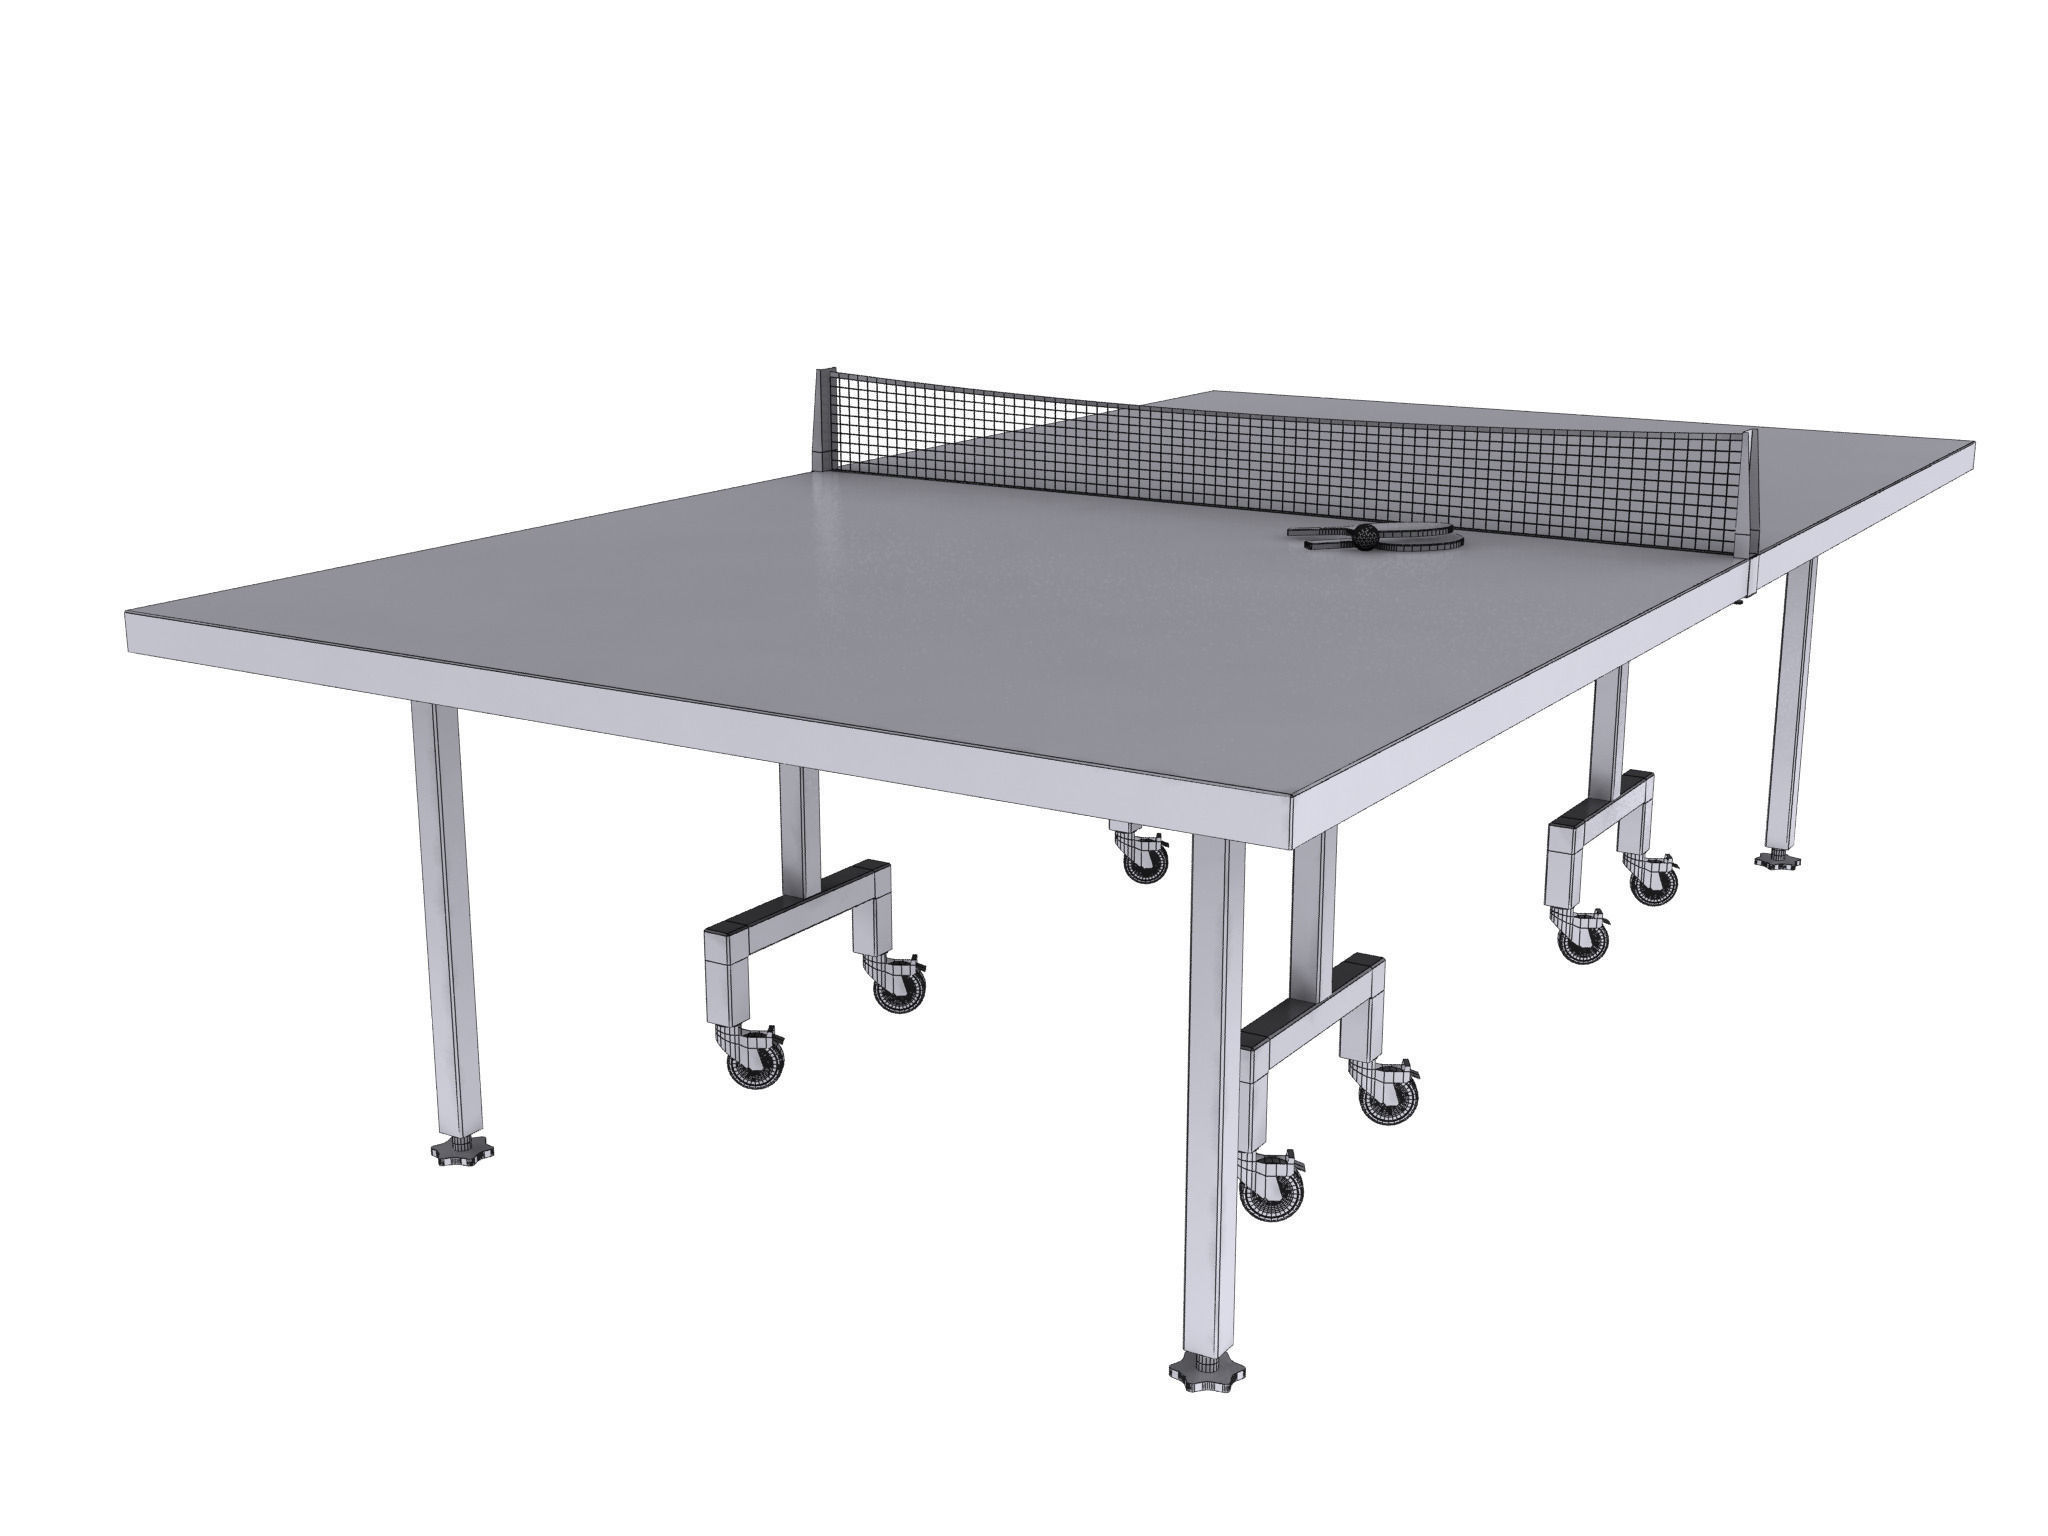 Table Tennis Or Ping Pong 3d Model Max Obj 3ds Fbx Mtl Mat 7